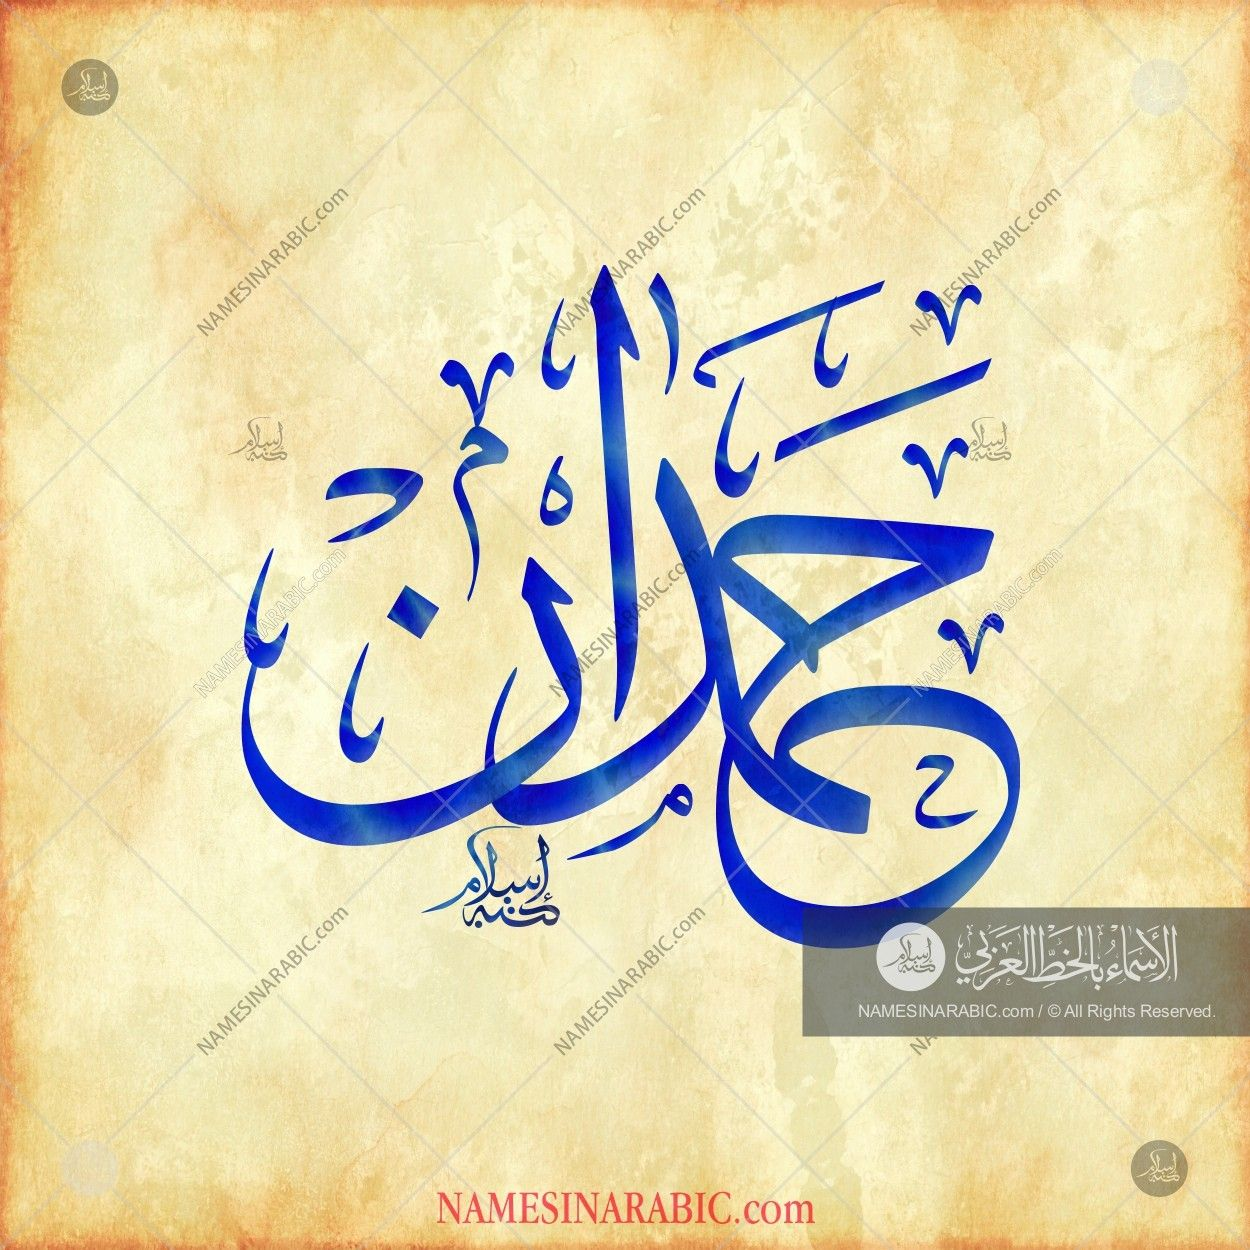 Hamdan Name In Arabic Calligraphy Calligraphy Name Name Art Name Wallpaper